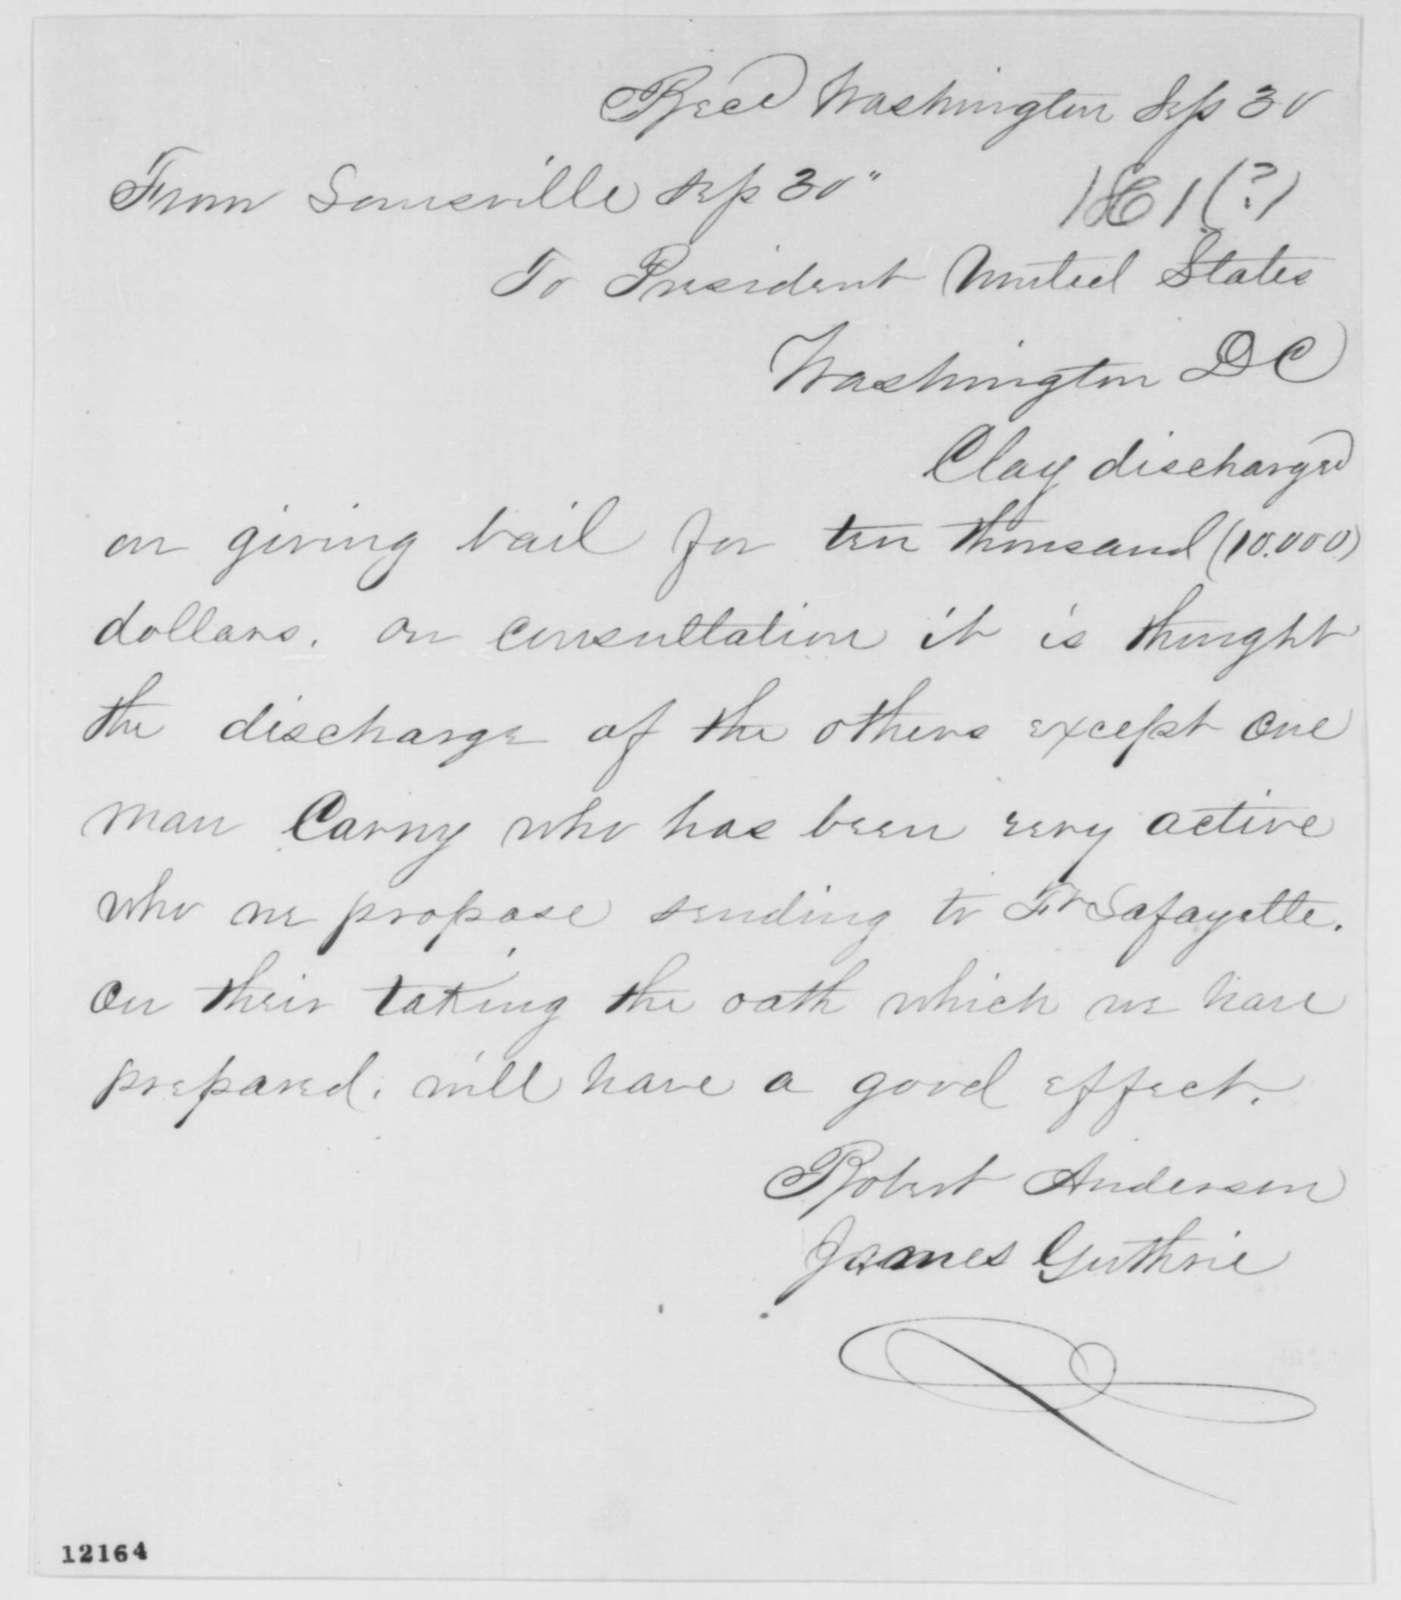 James Guthrie and Robert Anderson to Abraham Lincoln, Monday, September 30, 1861  (Telegram regarding arrests in Kentucky)